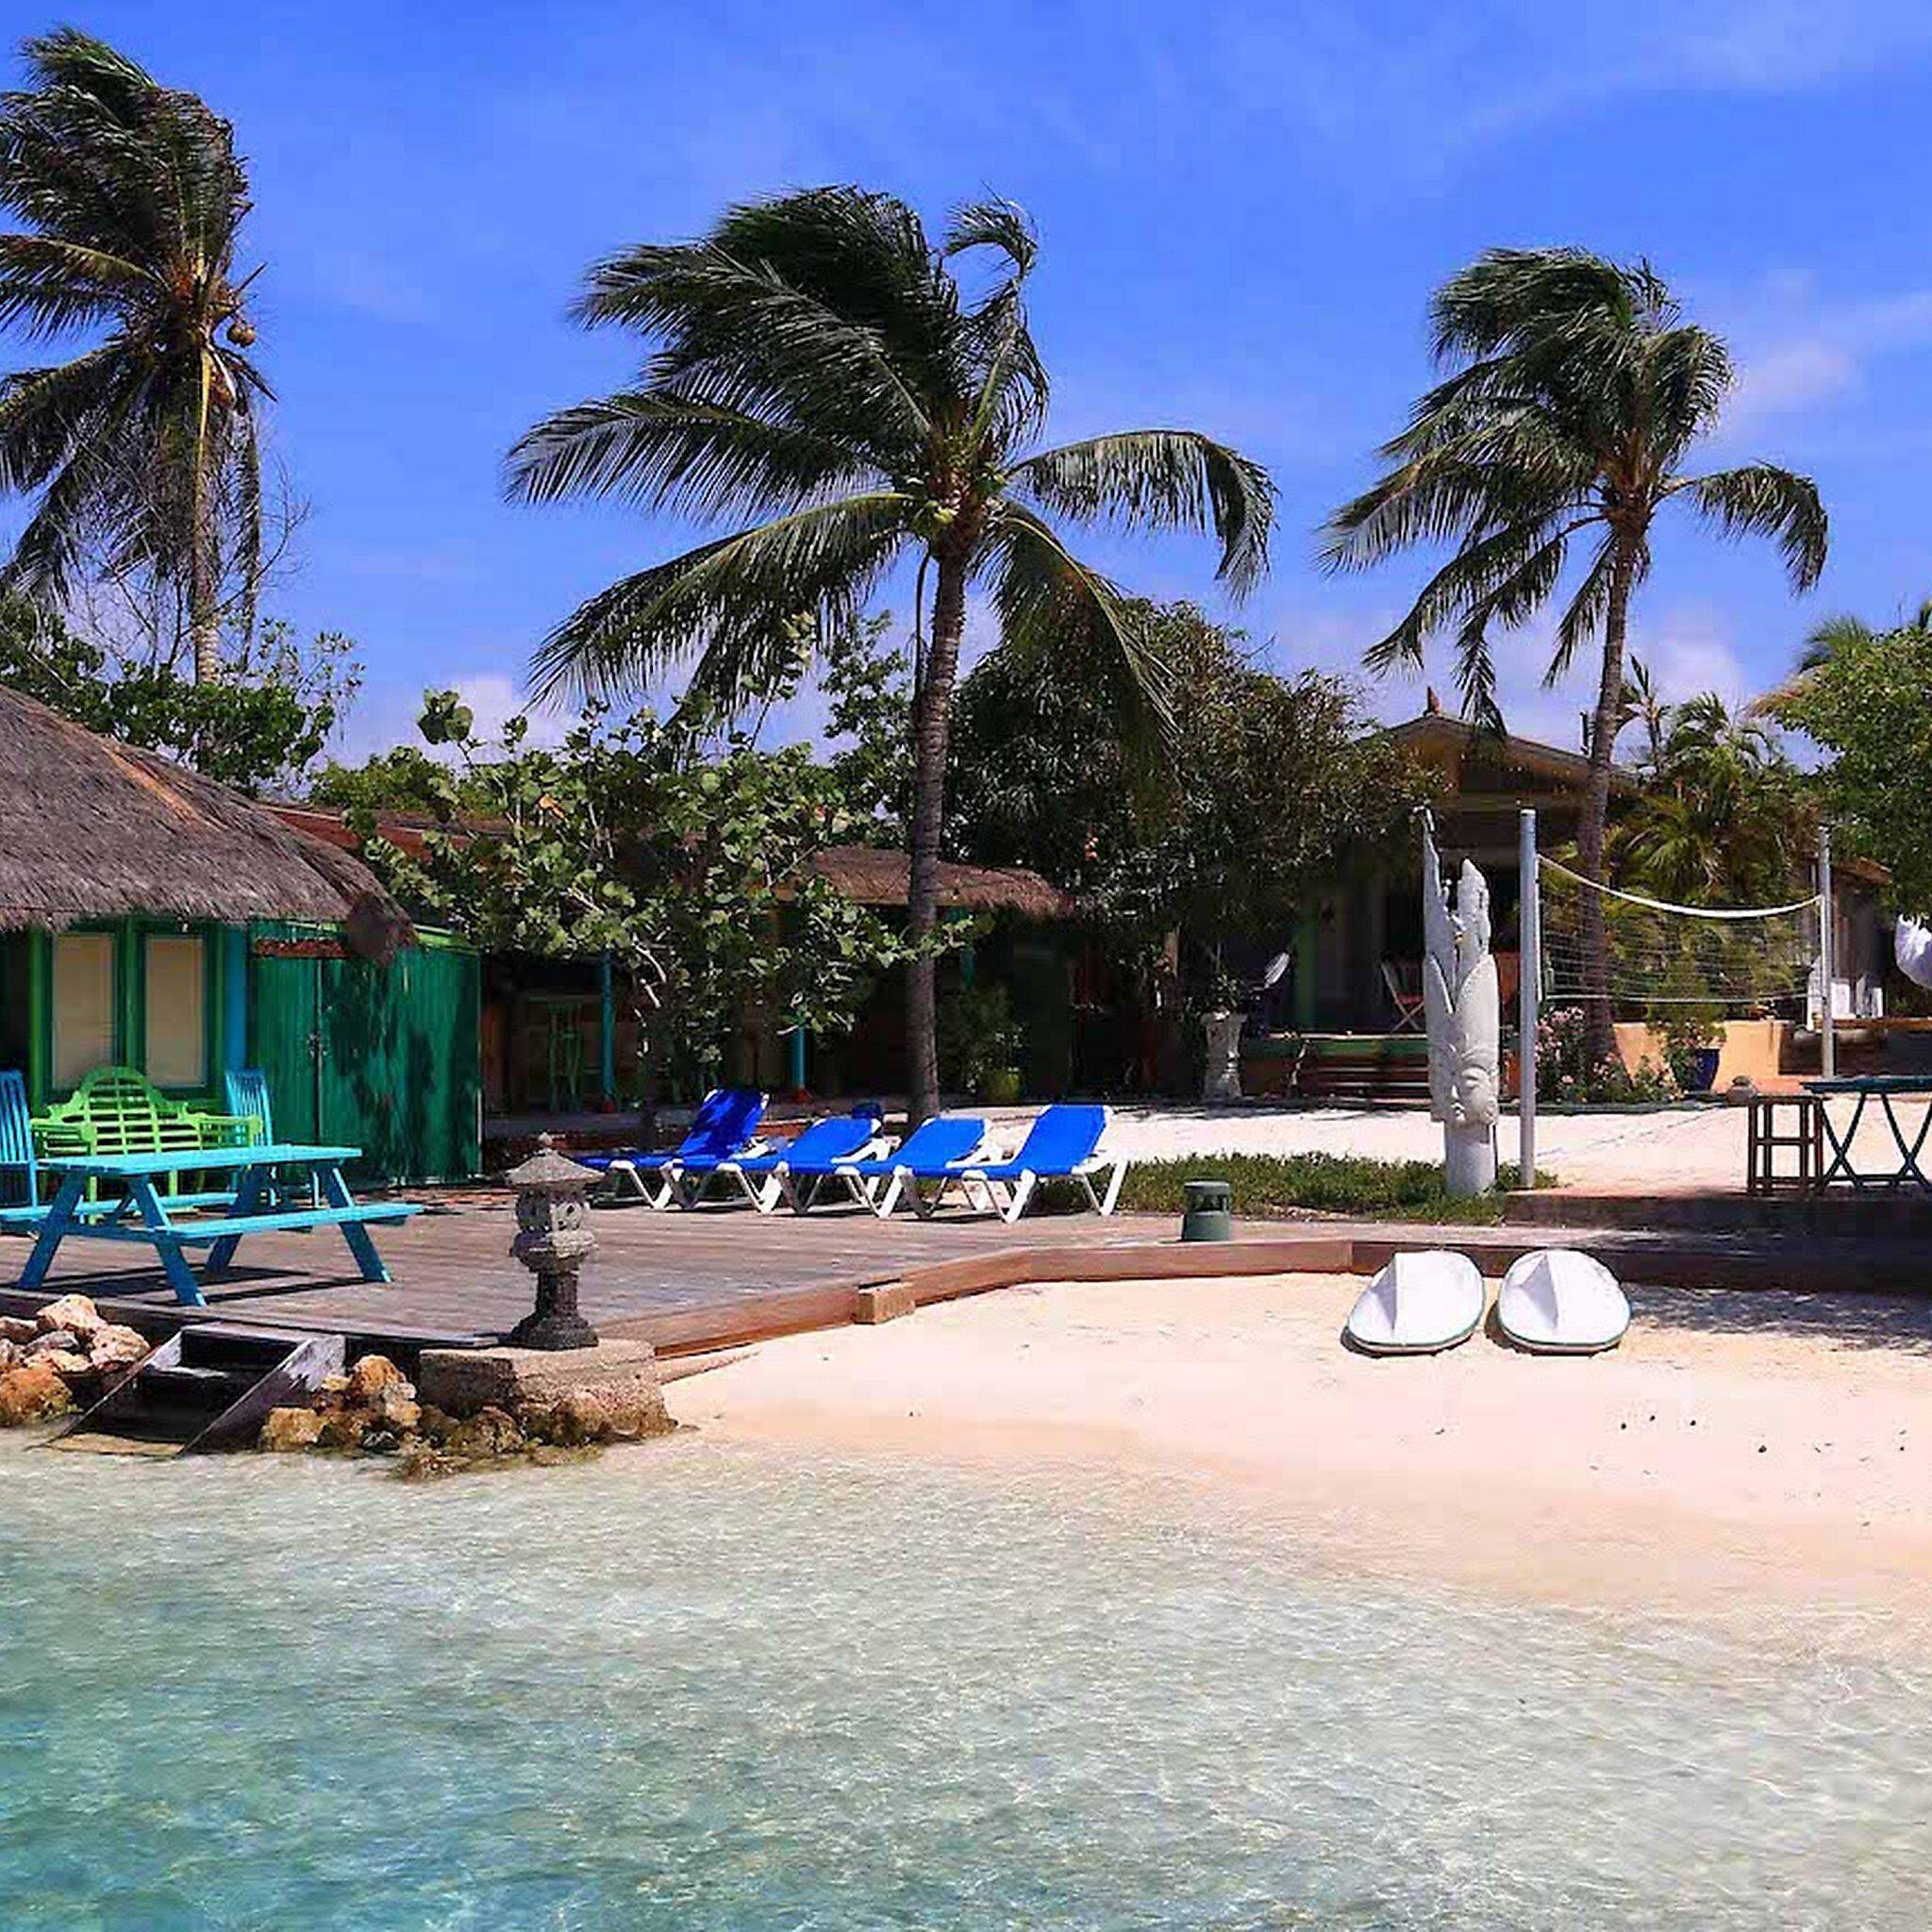 Private Beach Apartments in the Caribbean - Aruba Reef ...